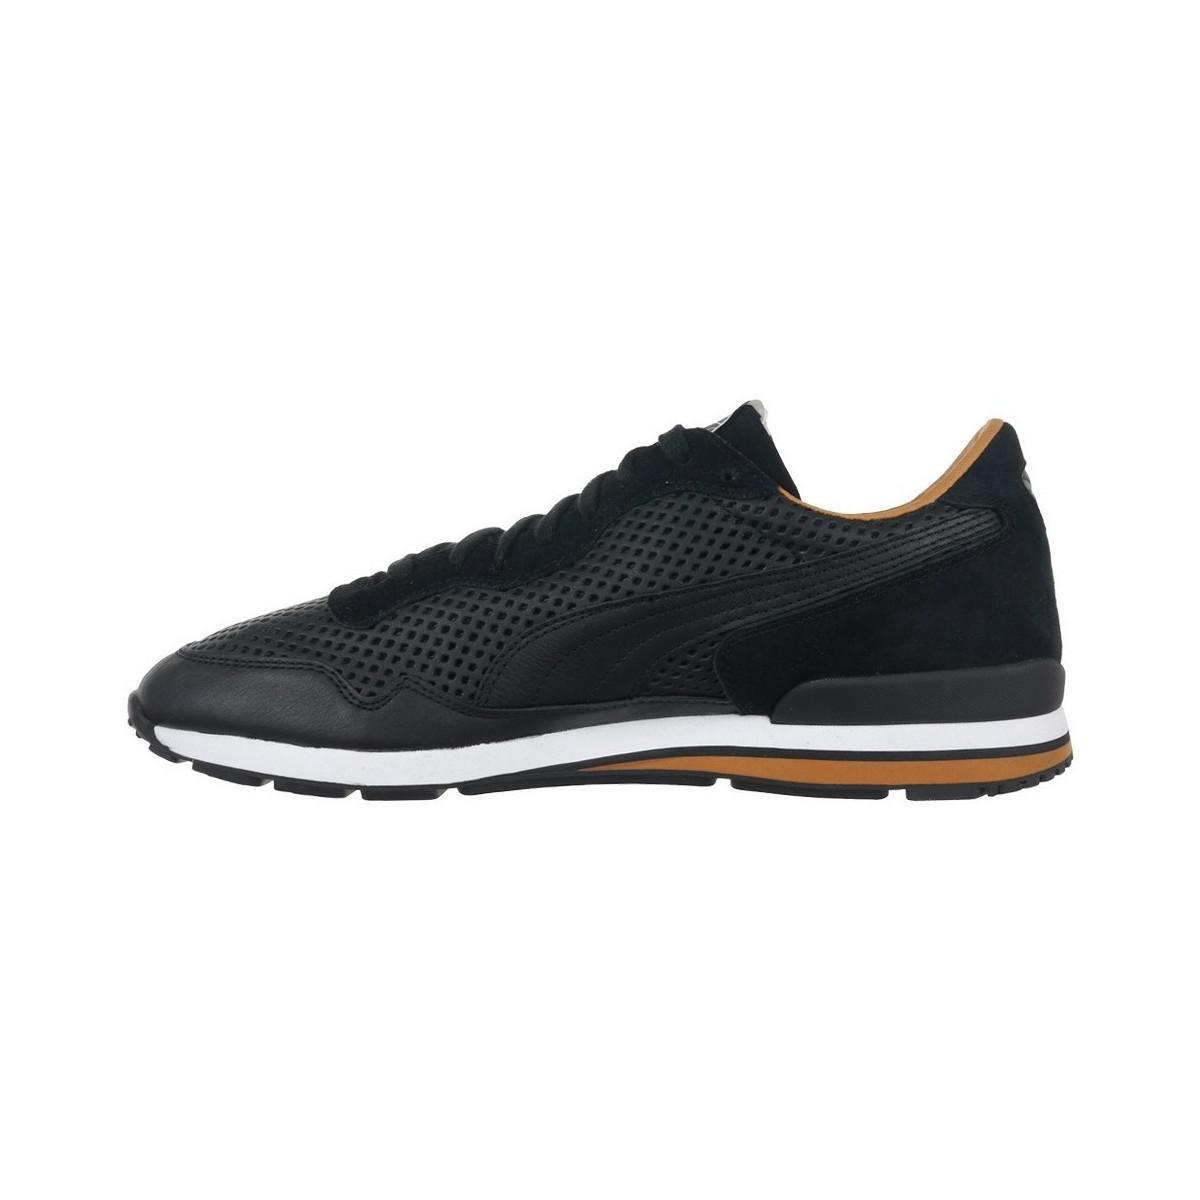 53c23dc8ce5 PUMA Rainbow Hypernature Men s Shoes (trainers) In Black in Black ...